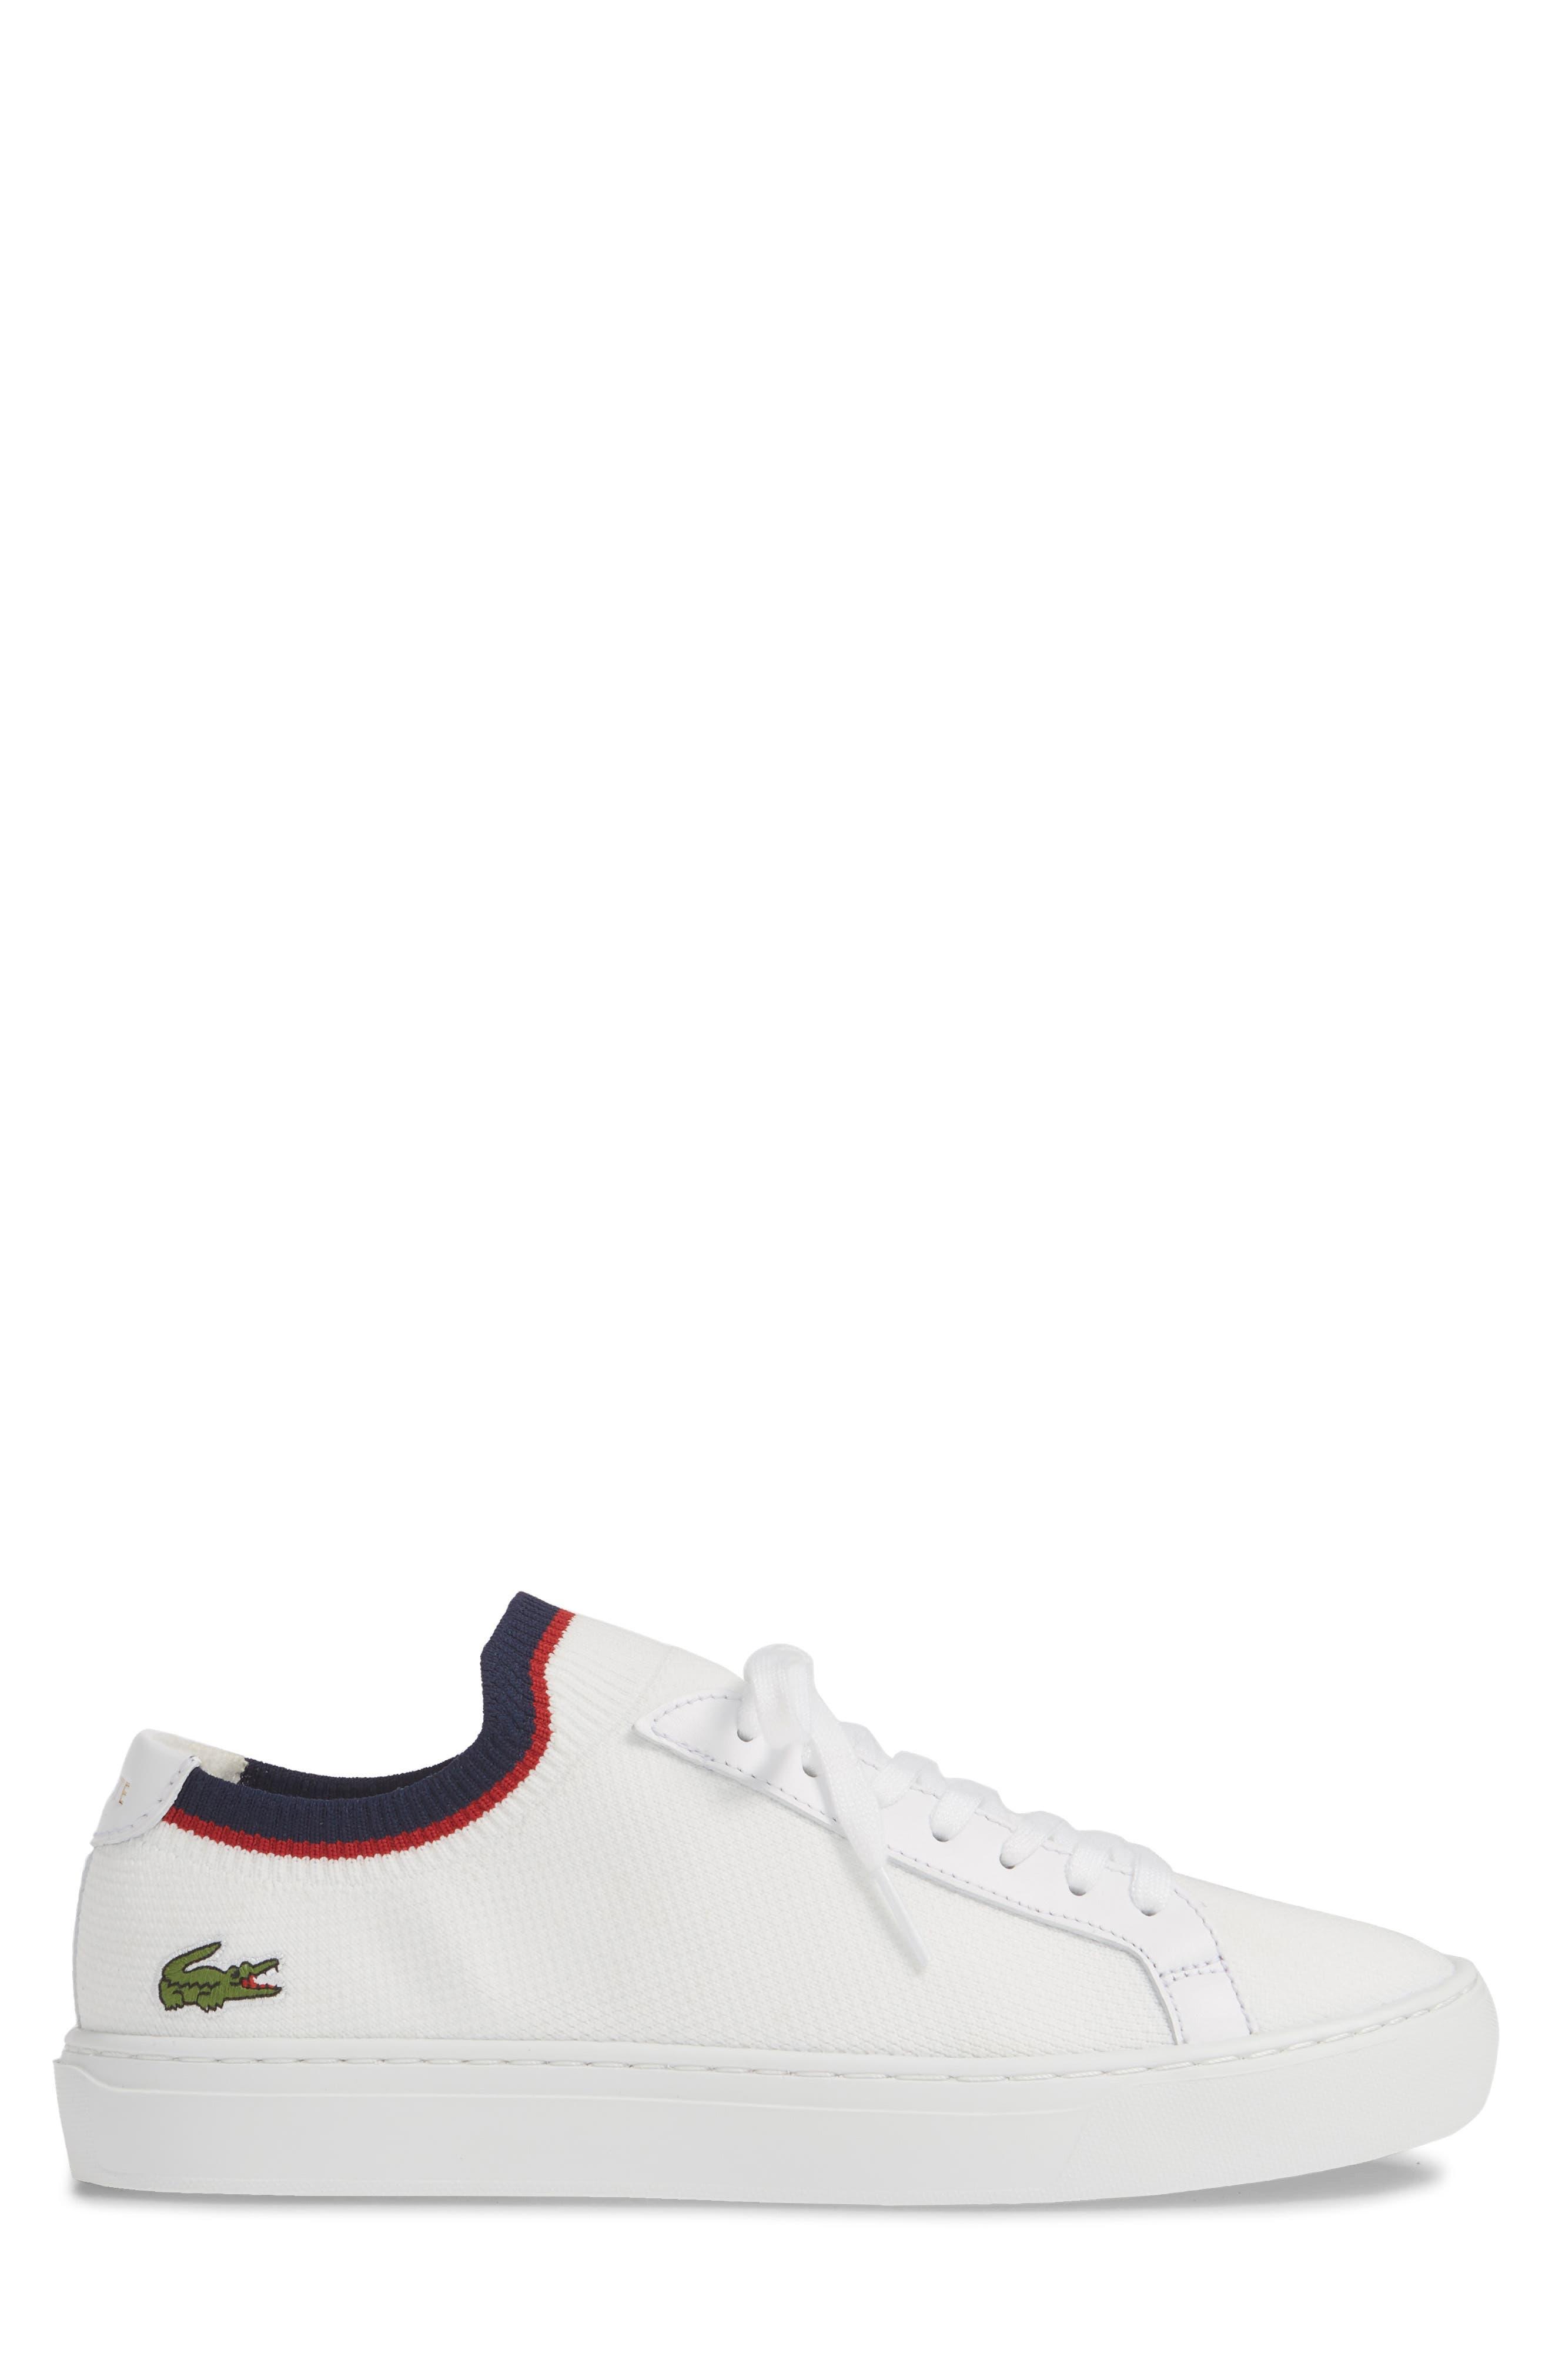 LACOSTE, Piqué Knit Sneaker, Alternate thumbnail 3, color, WHITE/ NAVY/ RED